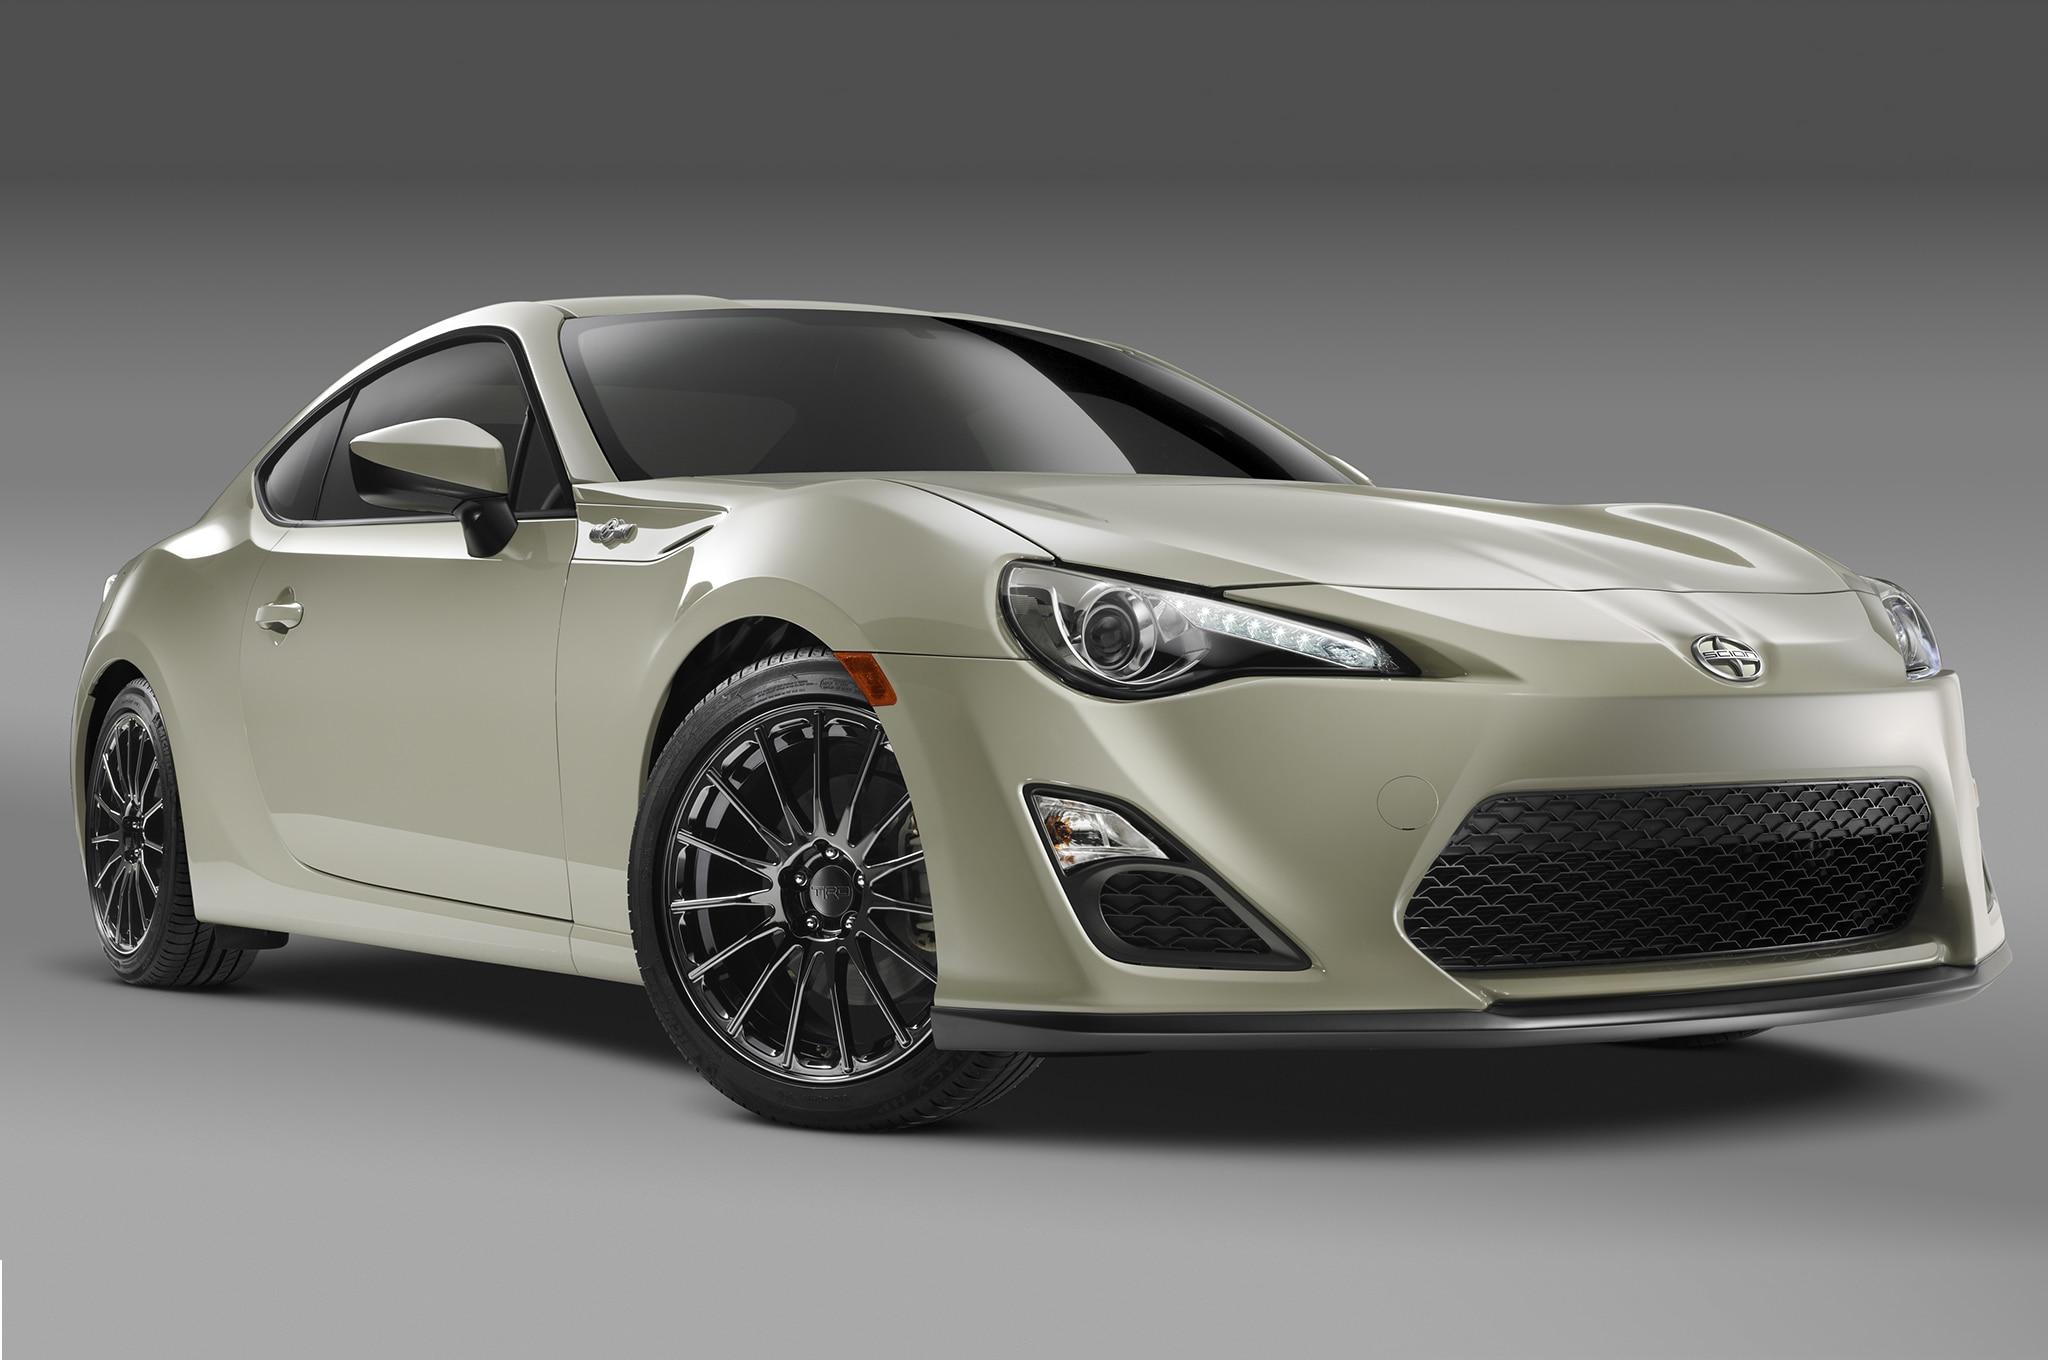 Scion Tc 0-60 >> Scion Tc 0 60 Upcoming New Car Release 2020